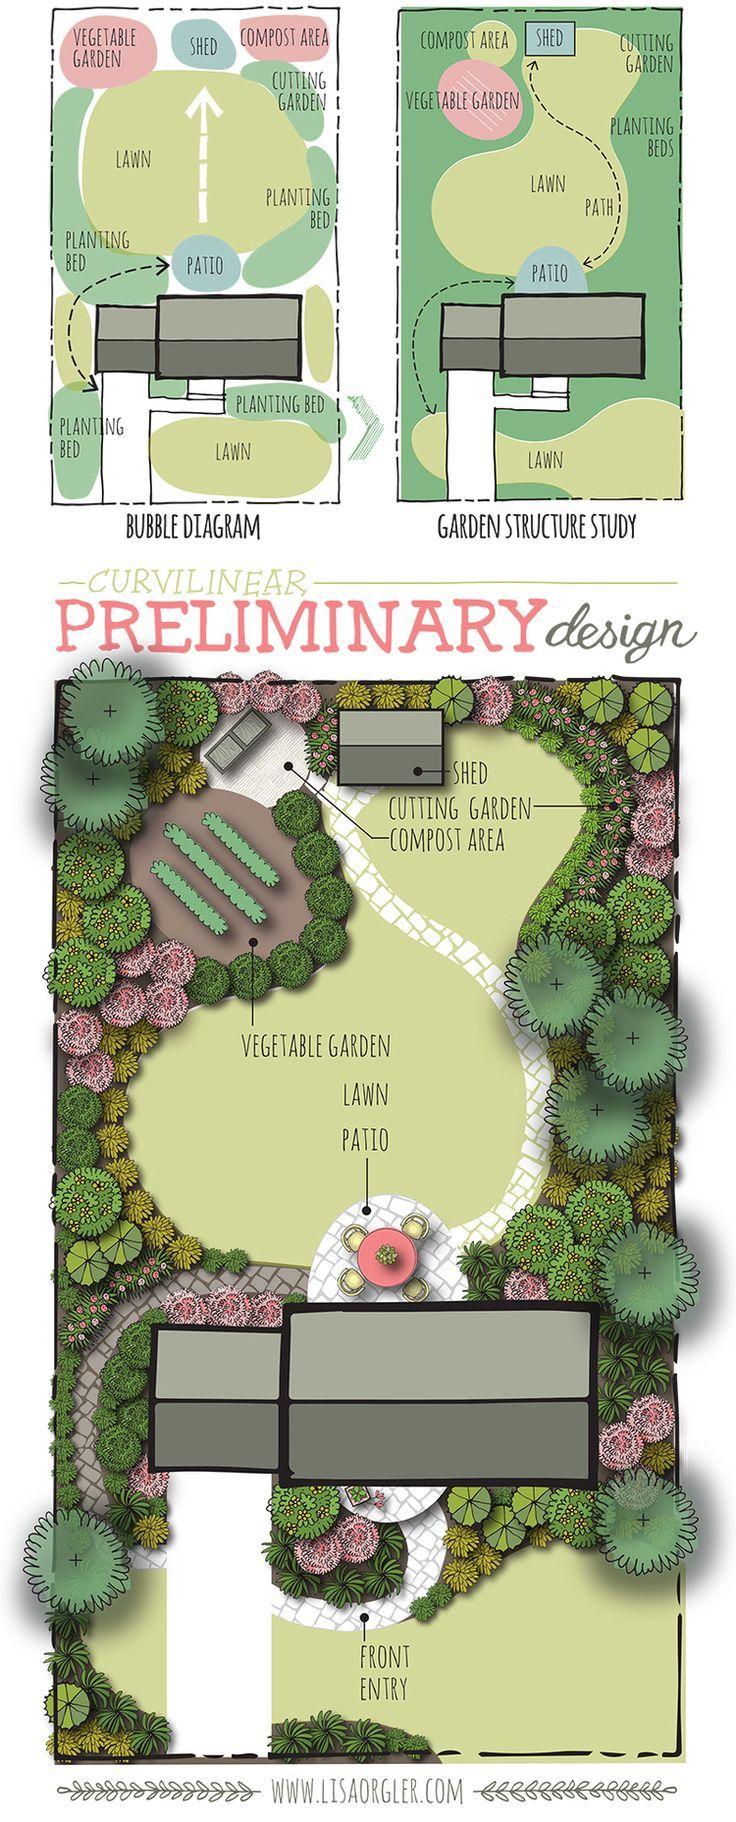 Curvilinear Preliminary Design #backyardlandscapedesign